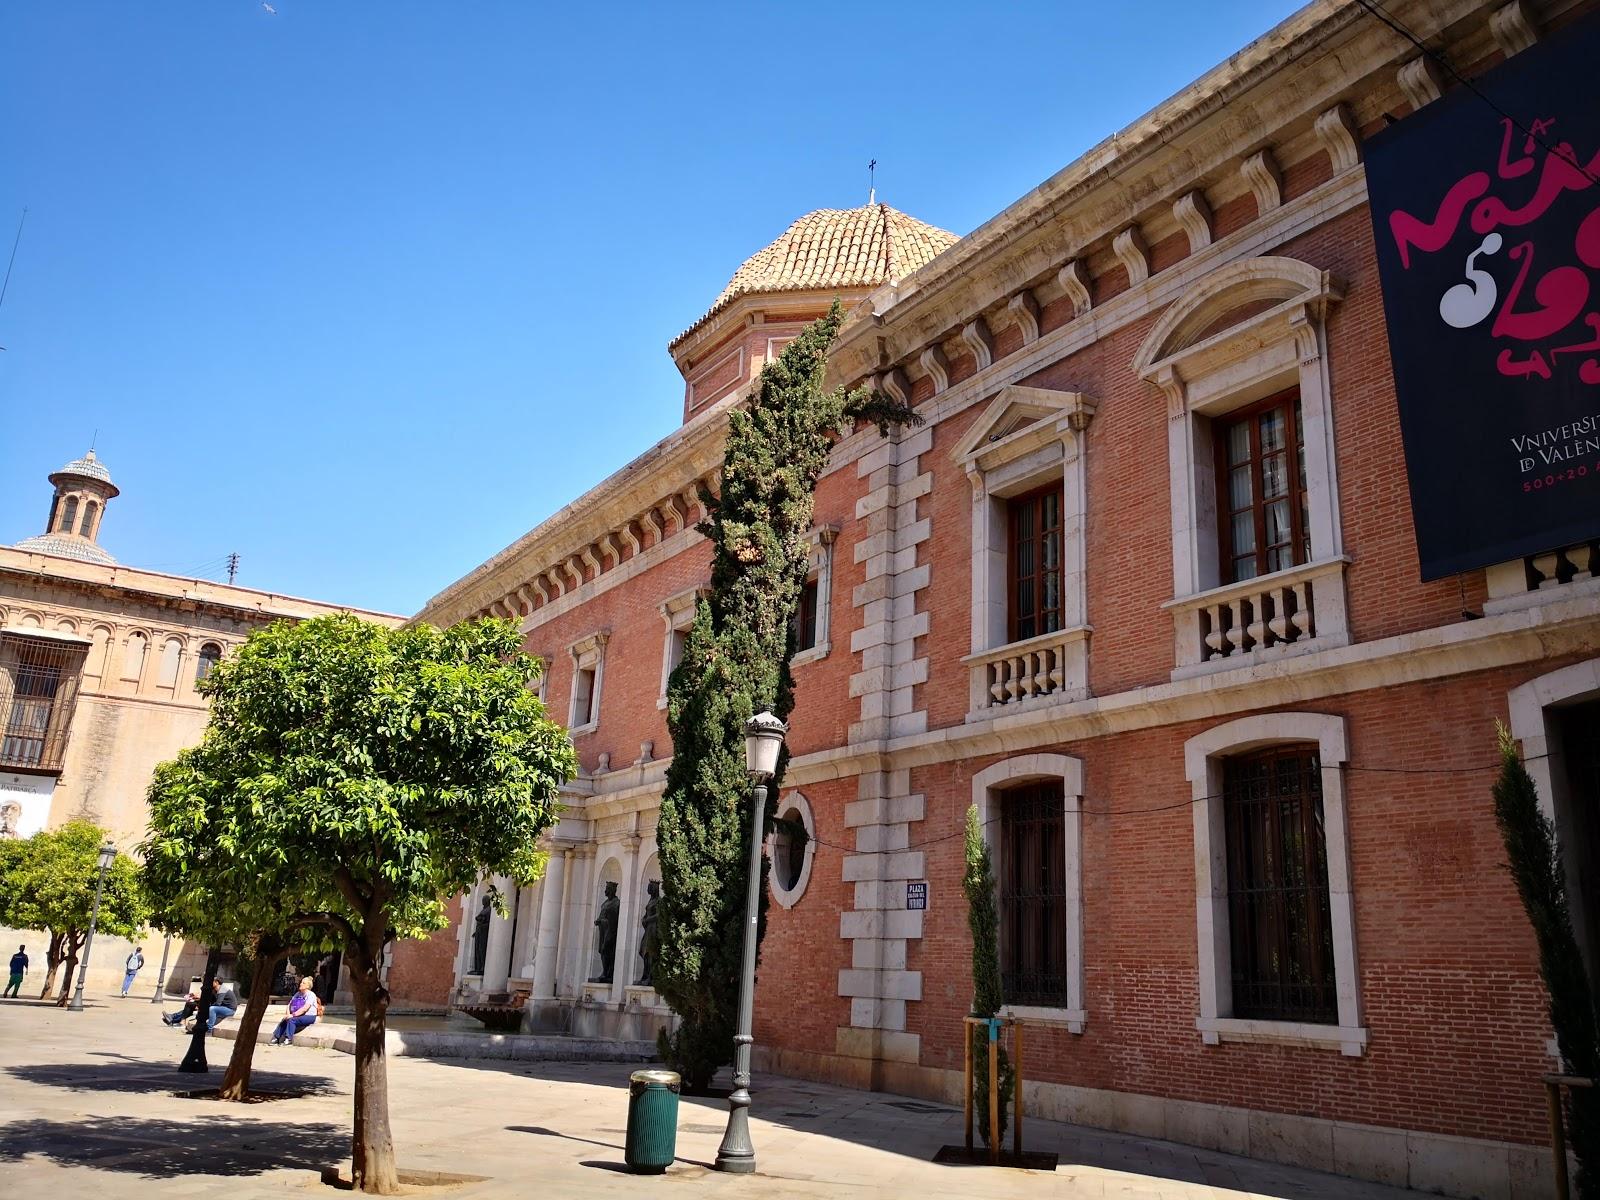 La Nau, Universidad de Valencia